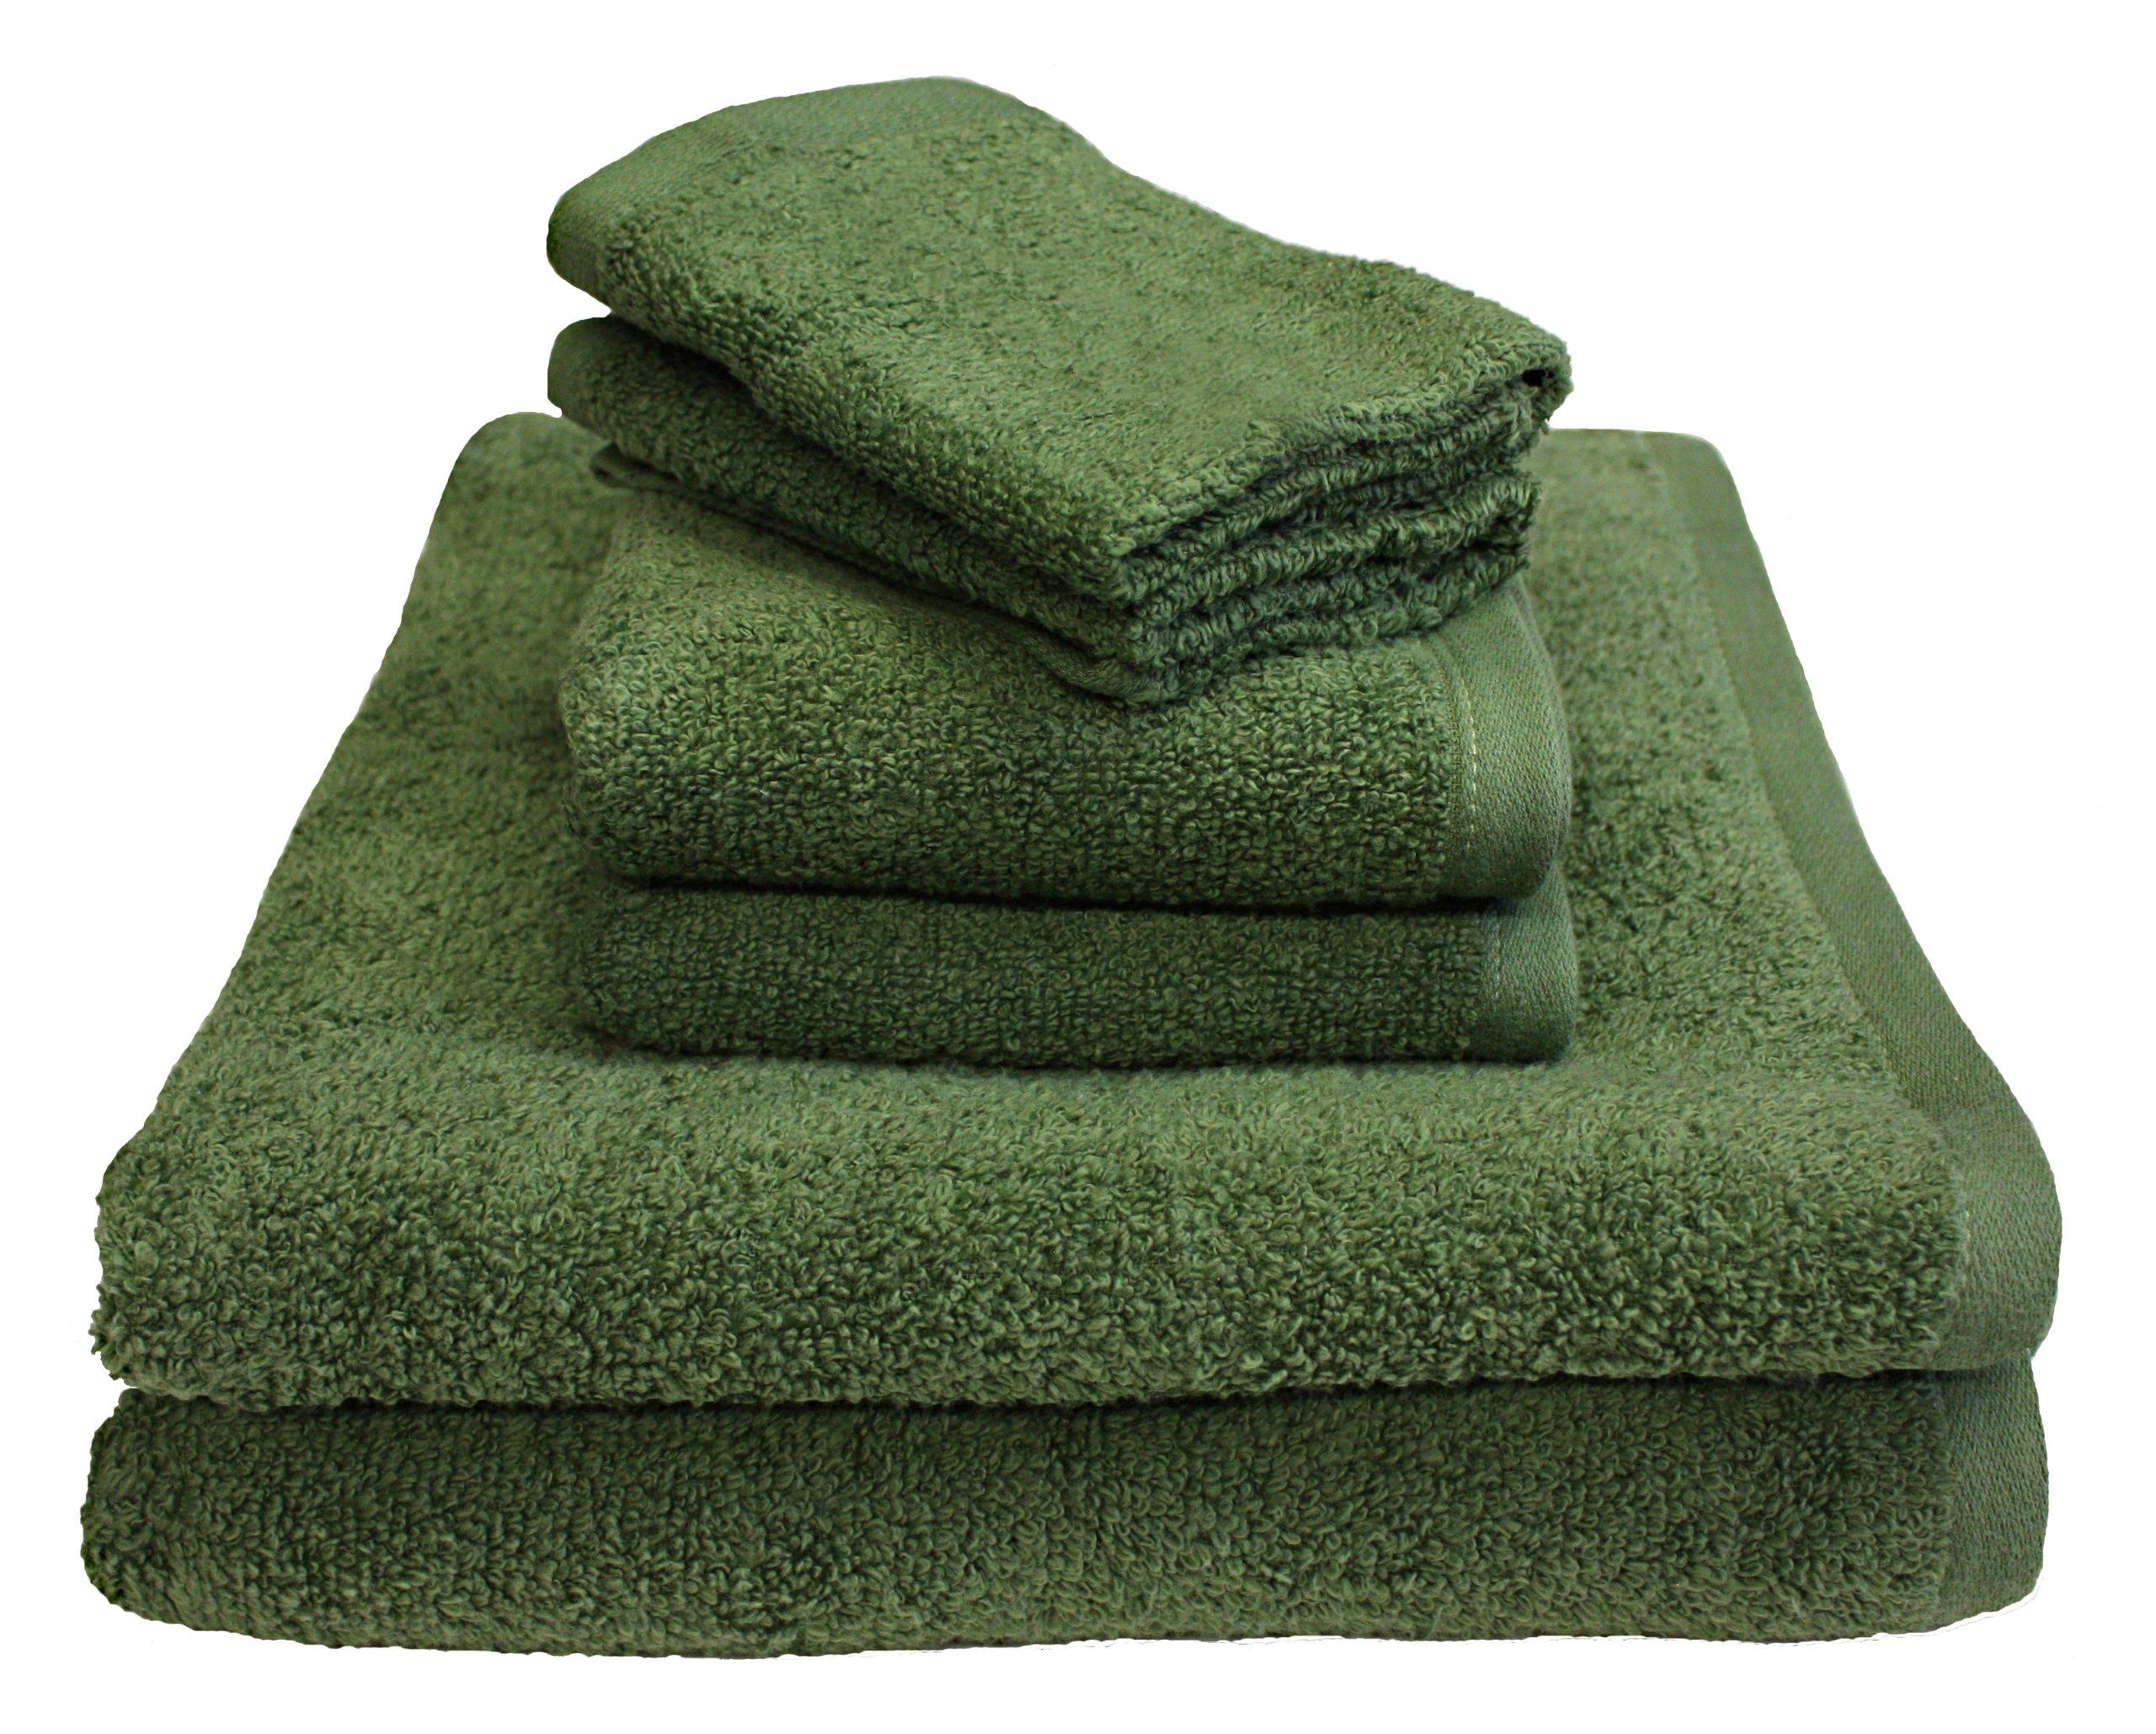 Luxury 6 Piece Cotton Bath Towel Set; 2 Bath Towels 27 x 52'', 2 Hand Towels 16 x 27''and 2 Washcloths 13 x 13'', Hotel & Spa Quality, Super Soft and Ultra Absorbent for Bathroom & Washroom-Thyme Green